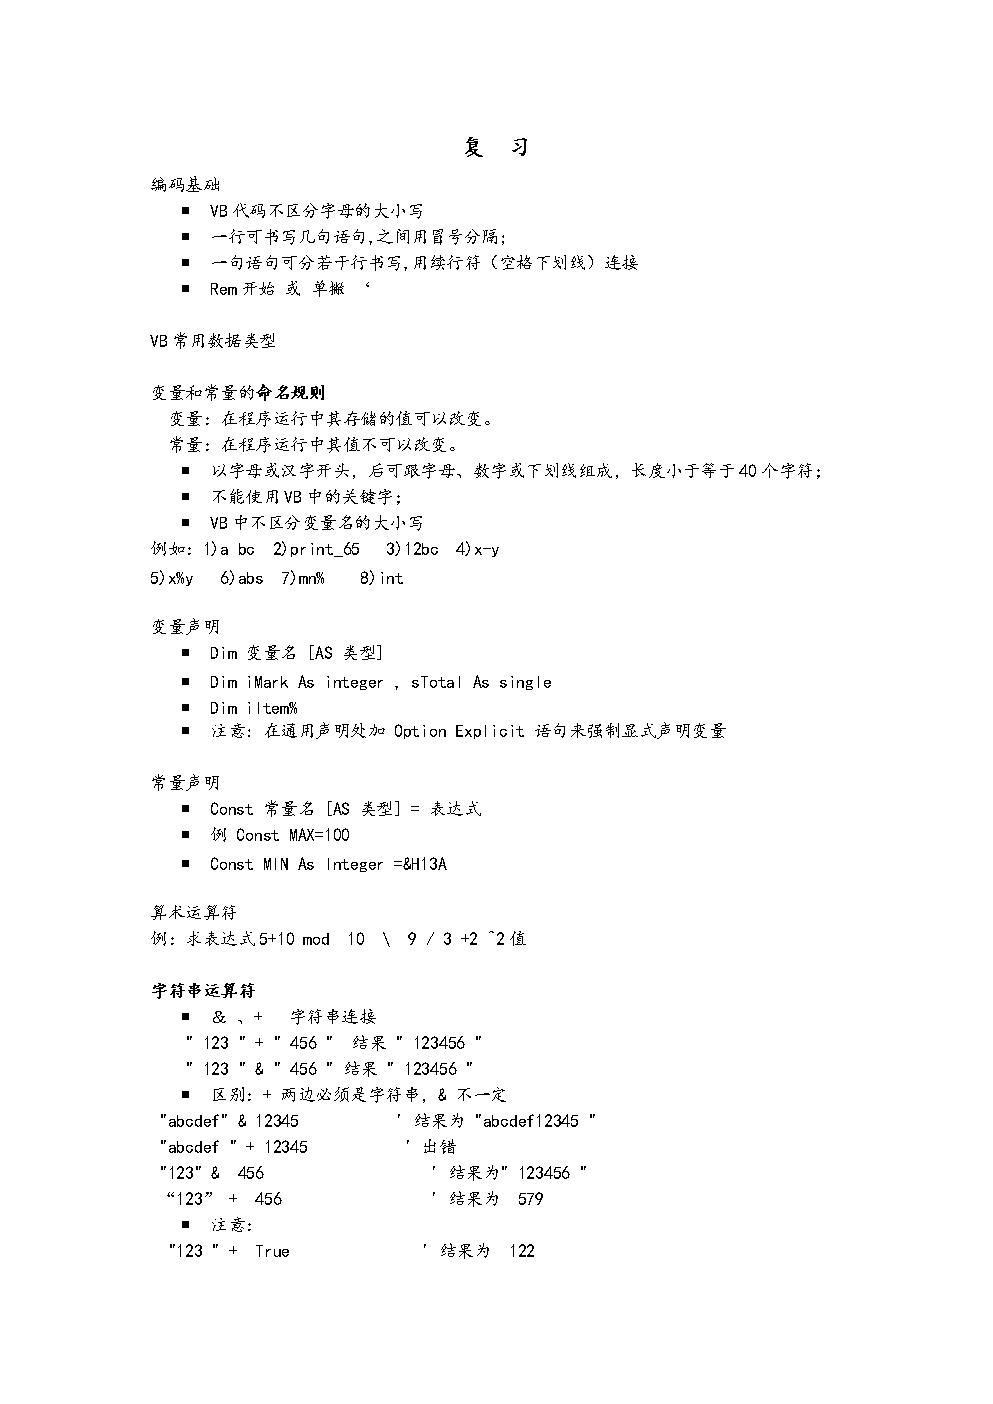 VB期末考试复习书本重点总结材料.doc